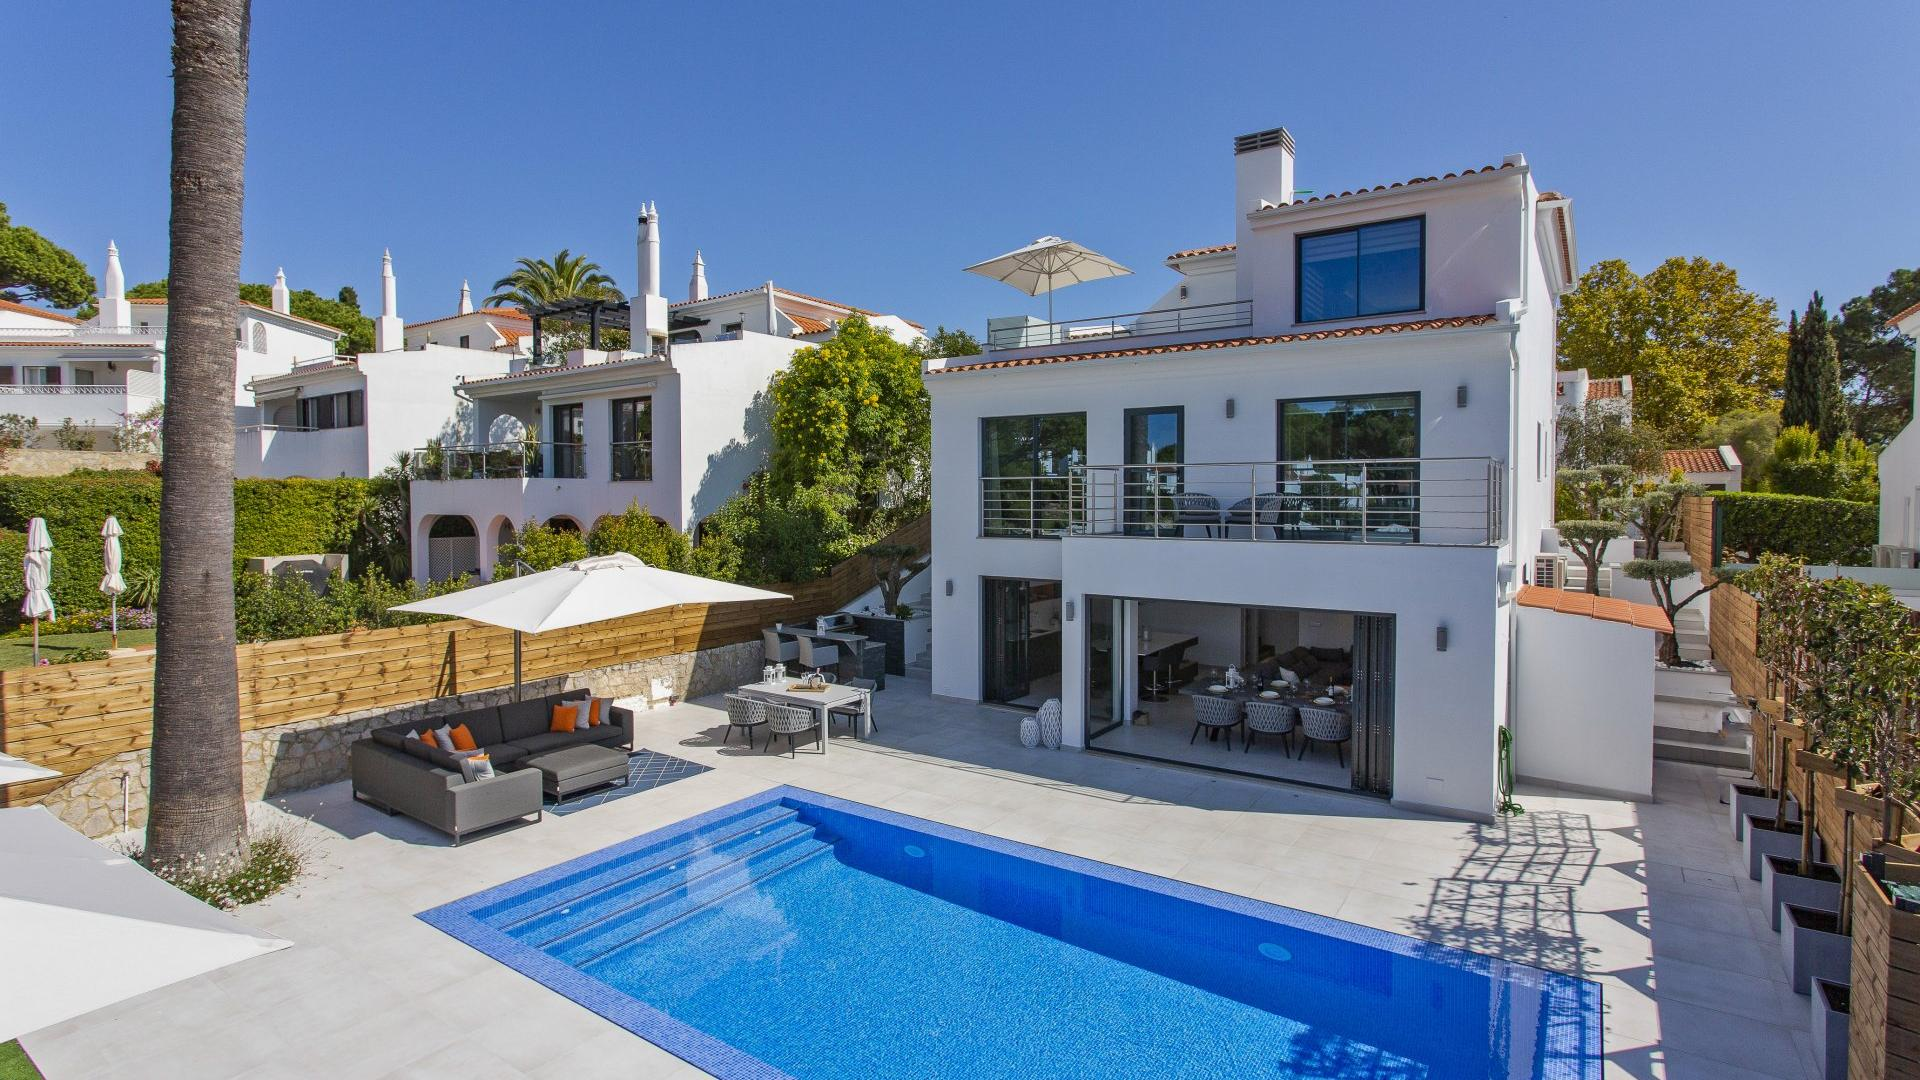 Villa Fin - Lakeside Village, Quinta do Lago, Algarve - Villa_Belle_Exterior_1.jpg